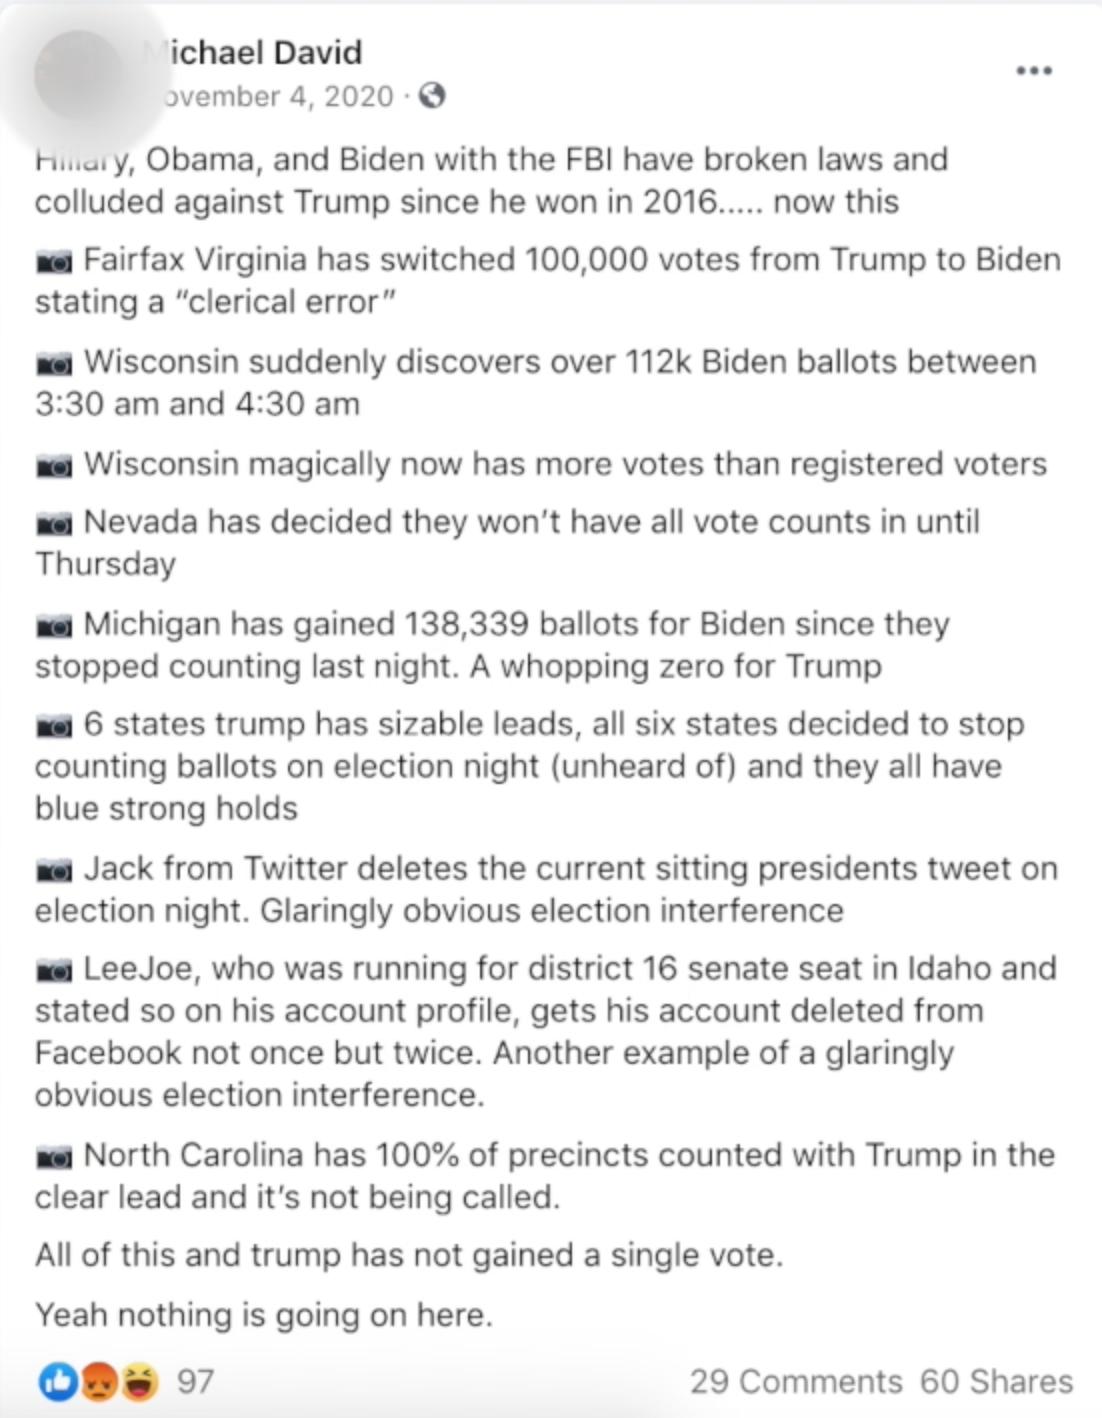 Stemmerding Facebook post on Nov. 4, 2020